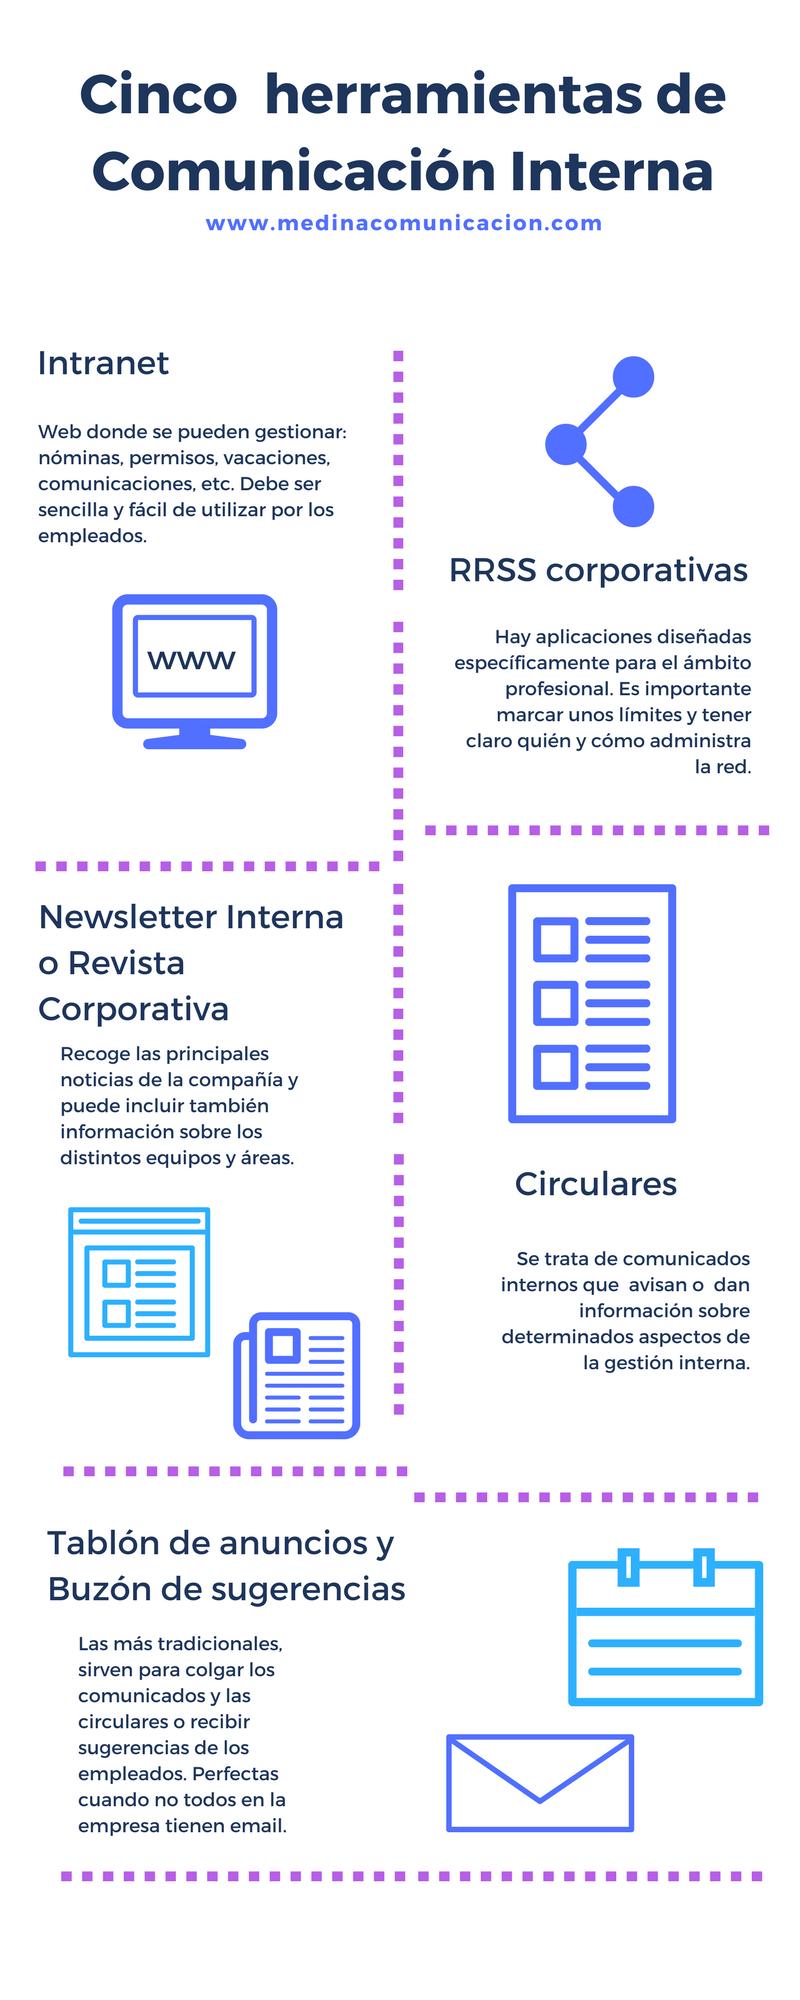 5 Herramientas De Comunicación Interna Infografia